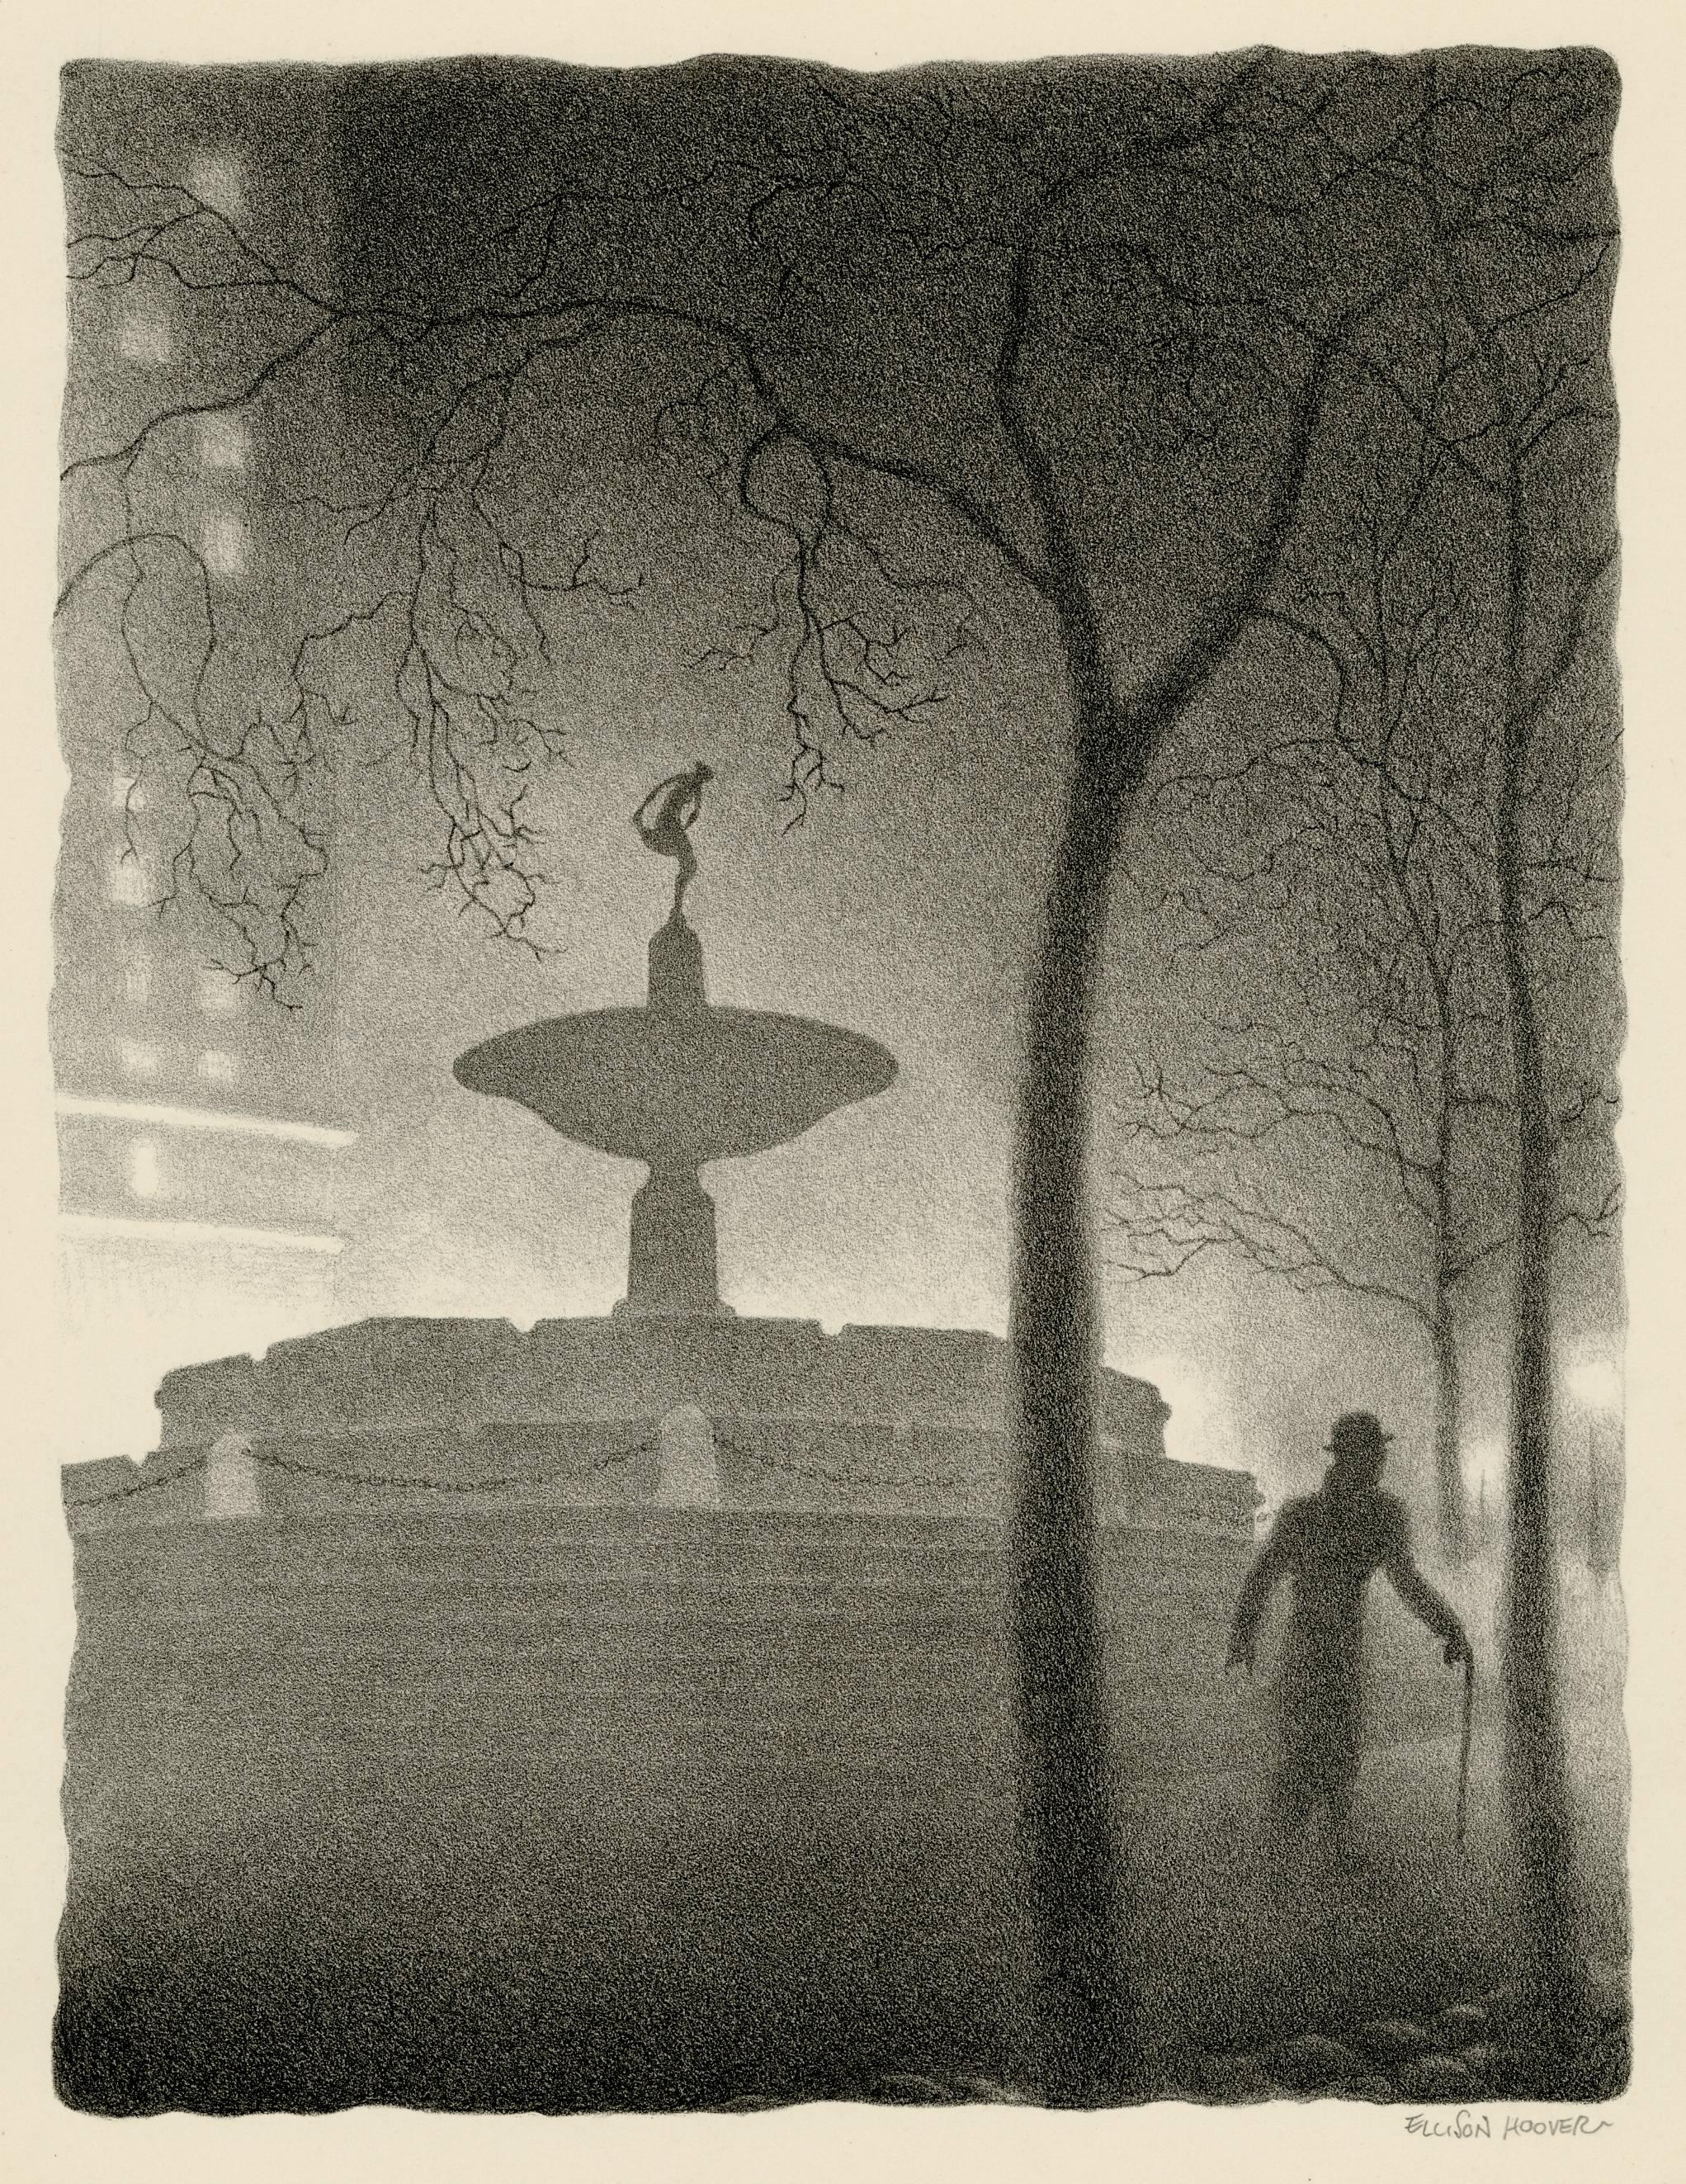 Pulitzer Fountain, Evening